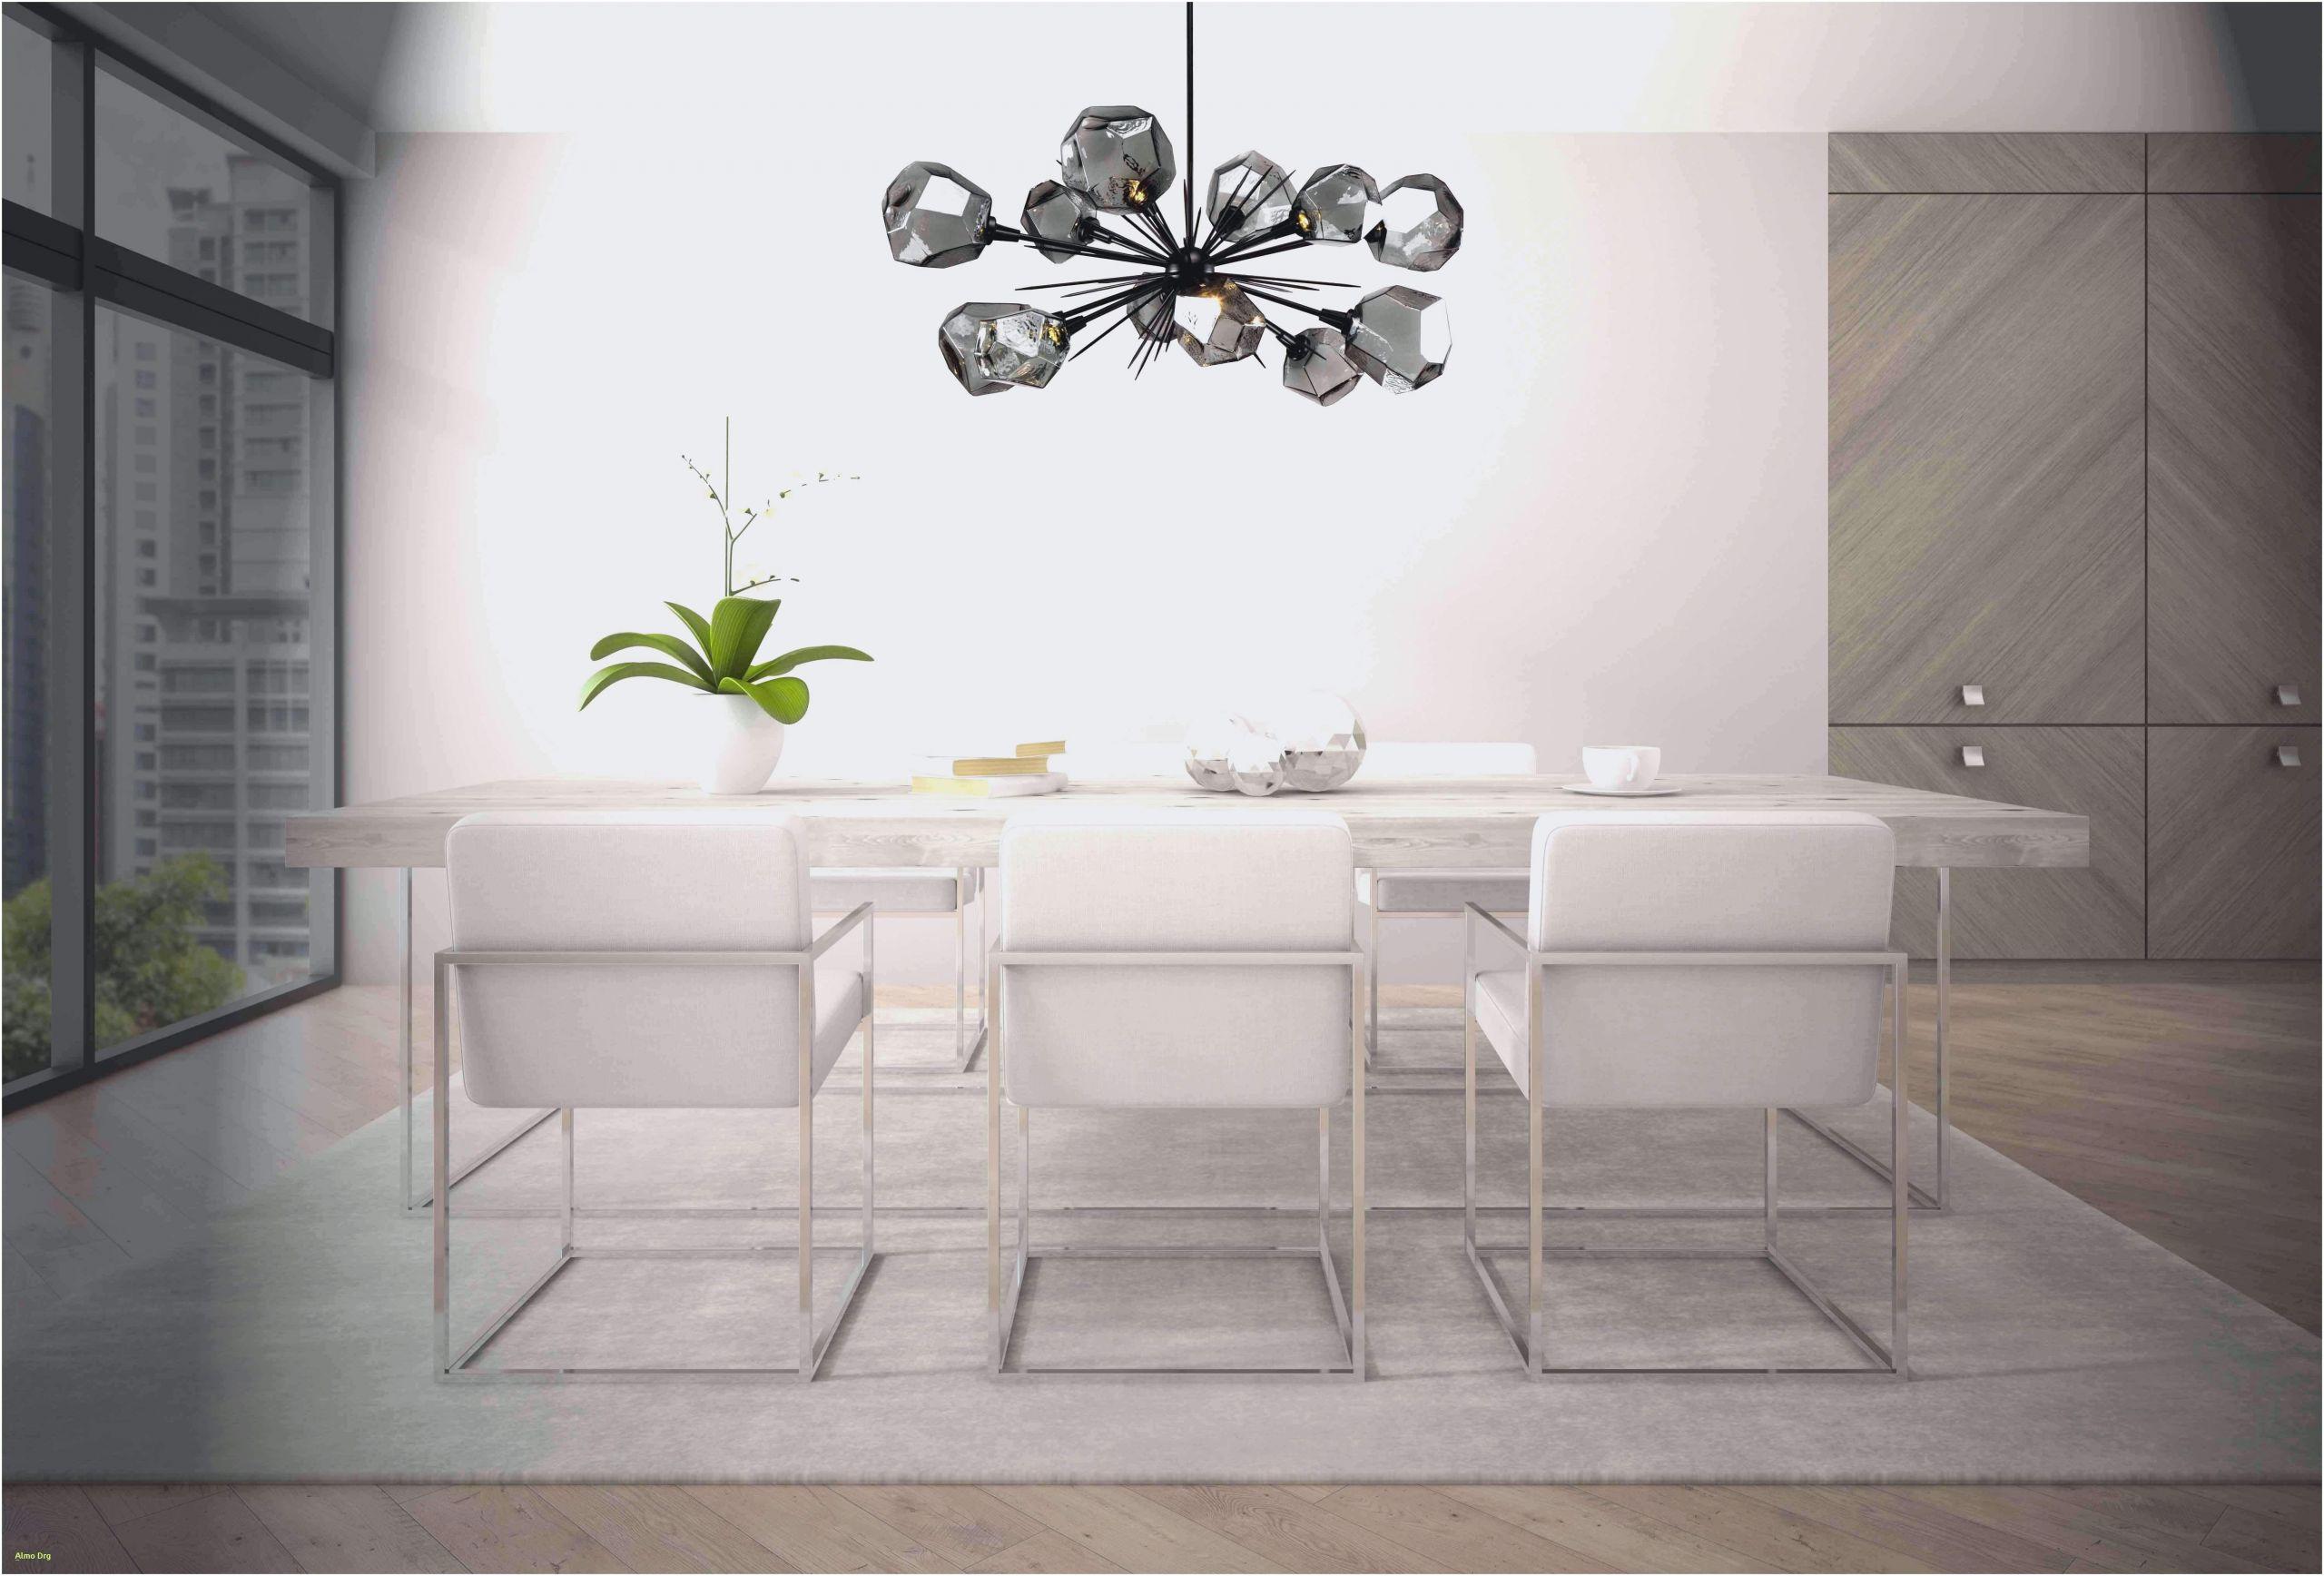 Lampen Badezimmer Design Wohnzimmer Design Ideen Luxus Luxe Led Lampe Badezimmer